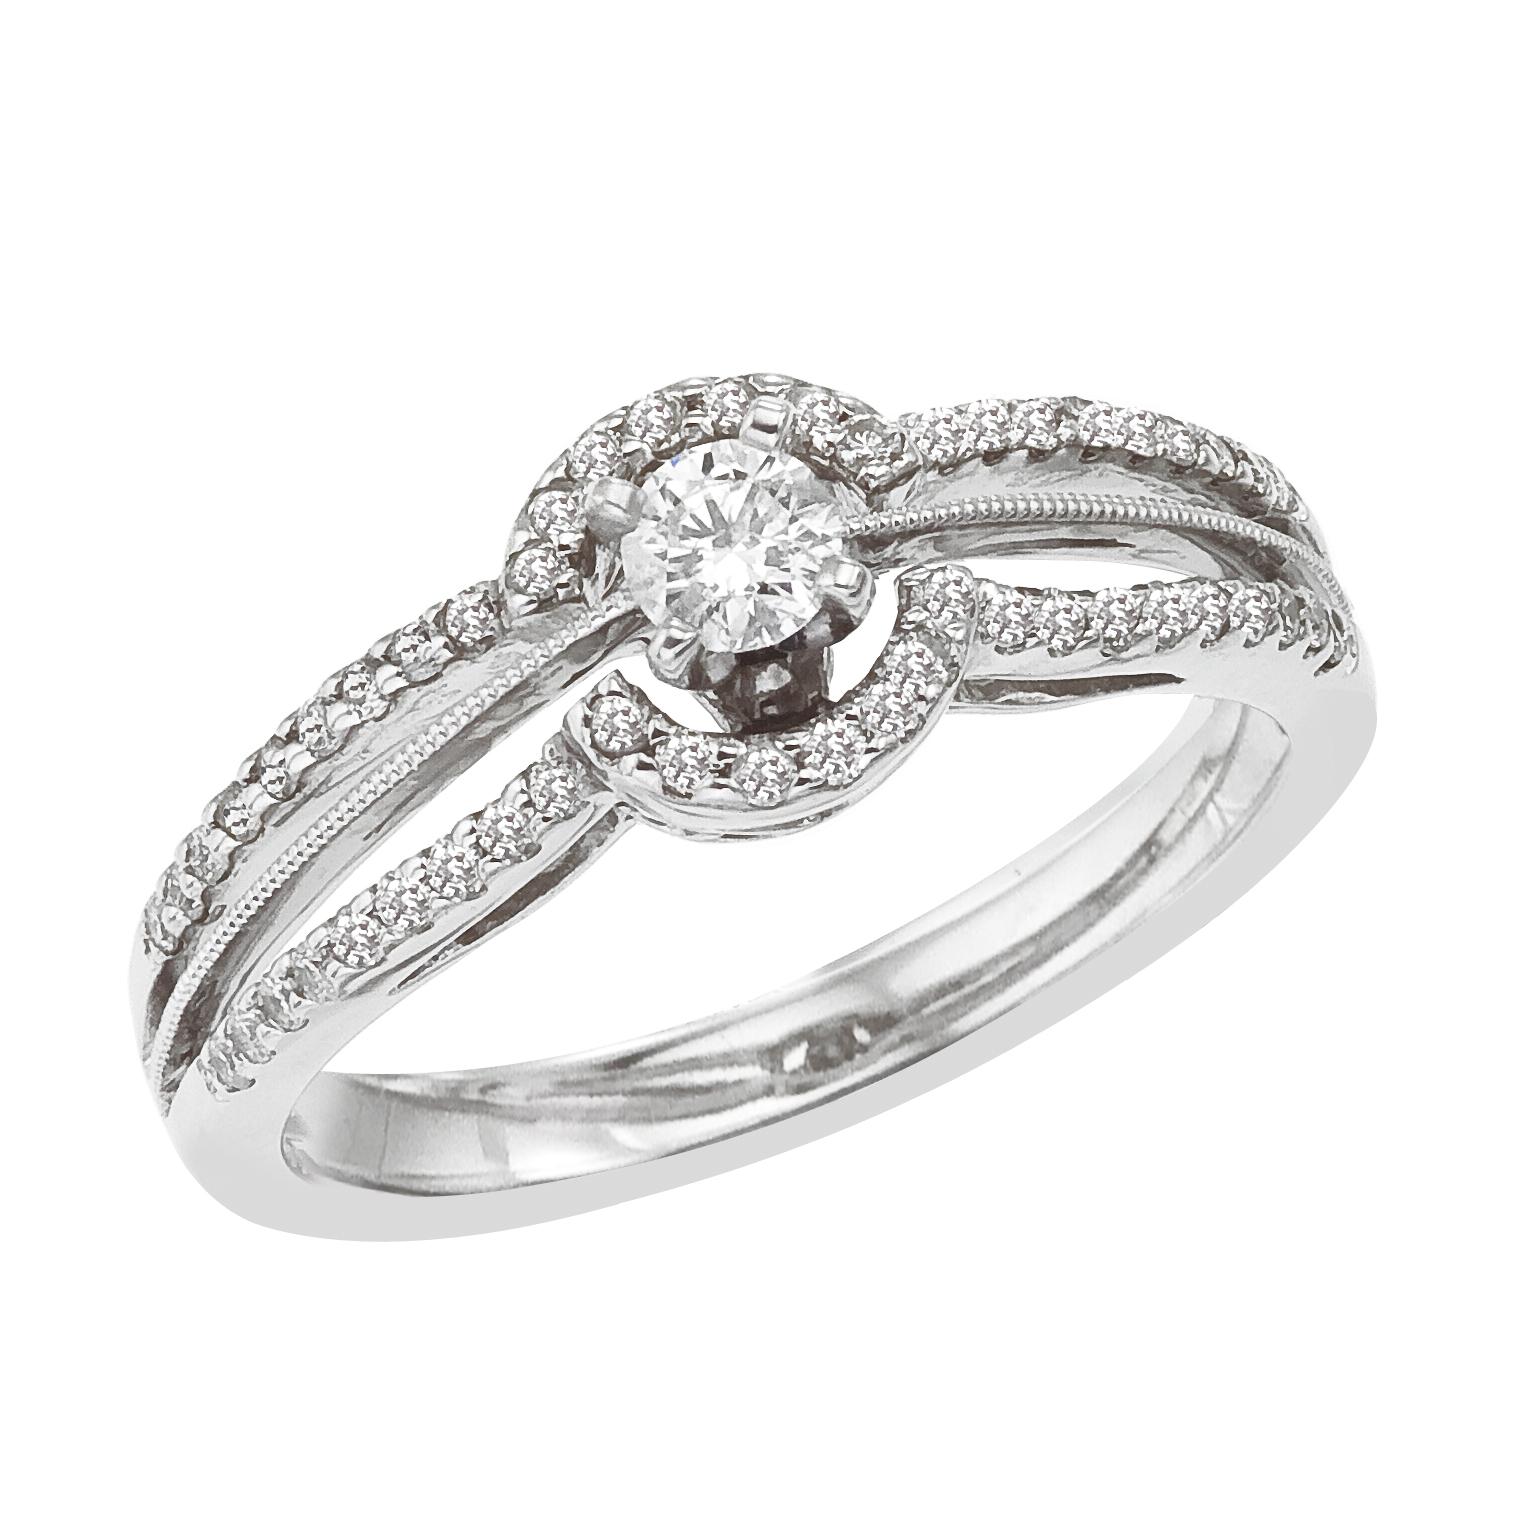 14k White gold Classic Diamond QPID Engagement Ring (0.32 tcw)